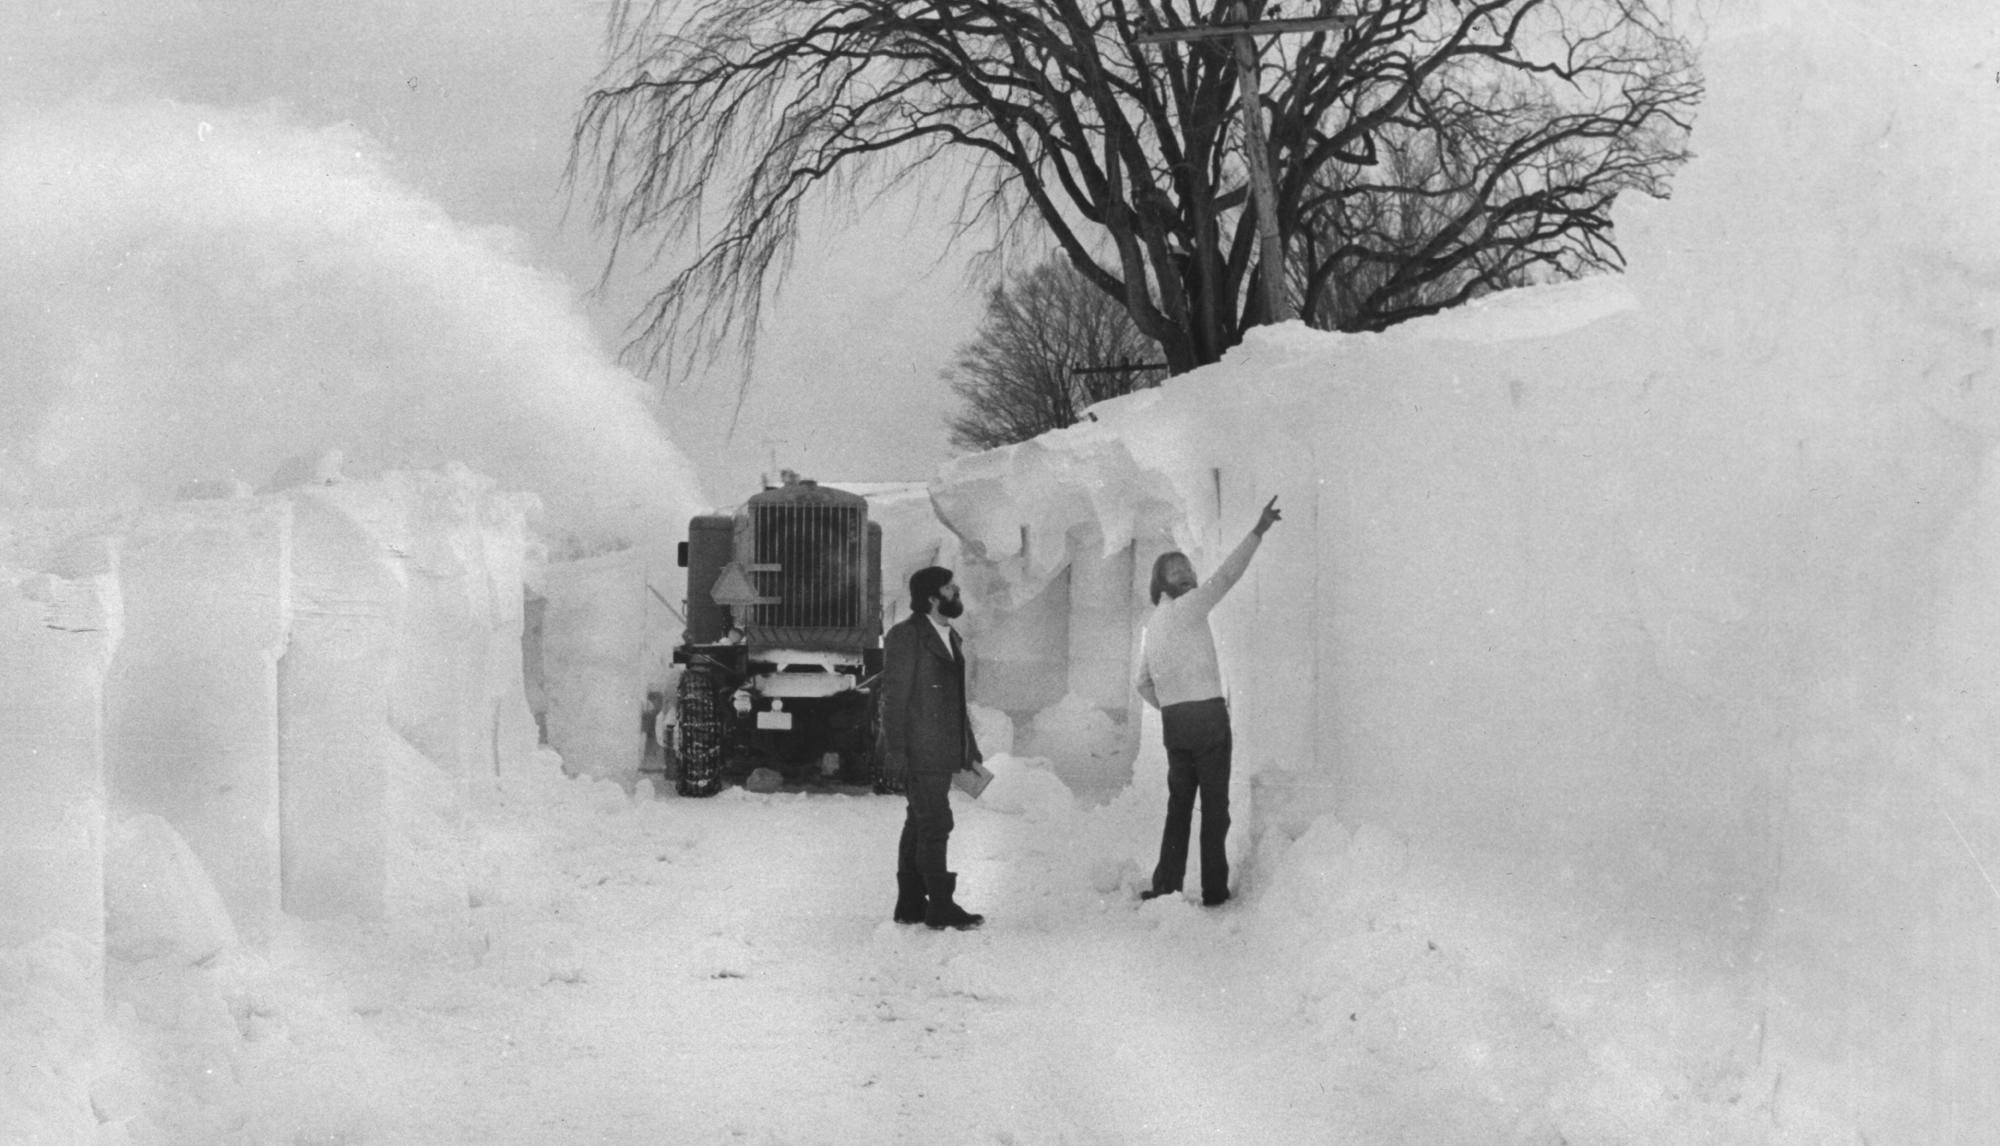 buffalo-blizzard-1977-1